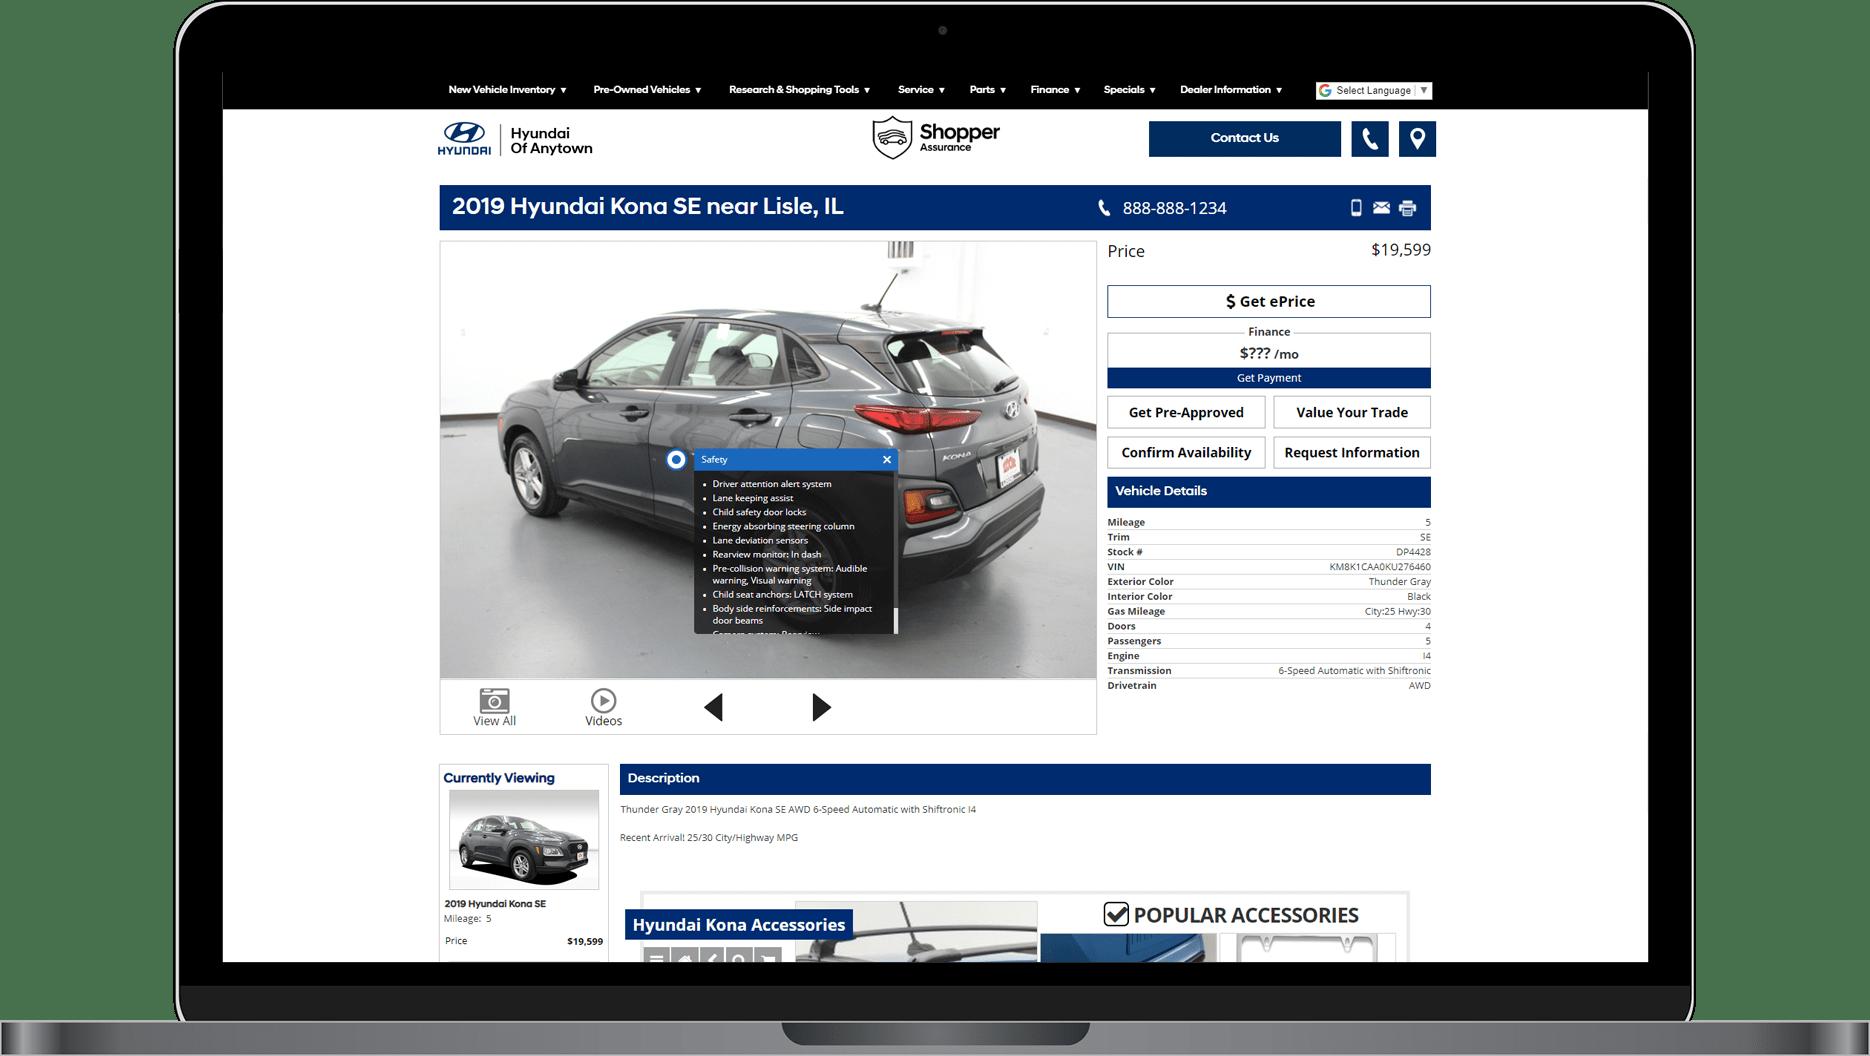 VDP showing Hyundai vehicle